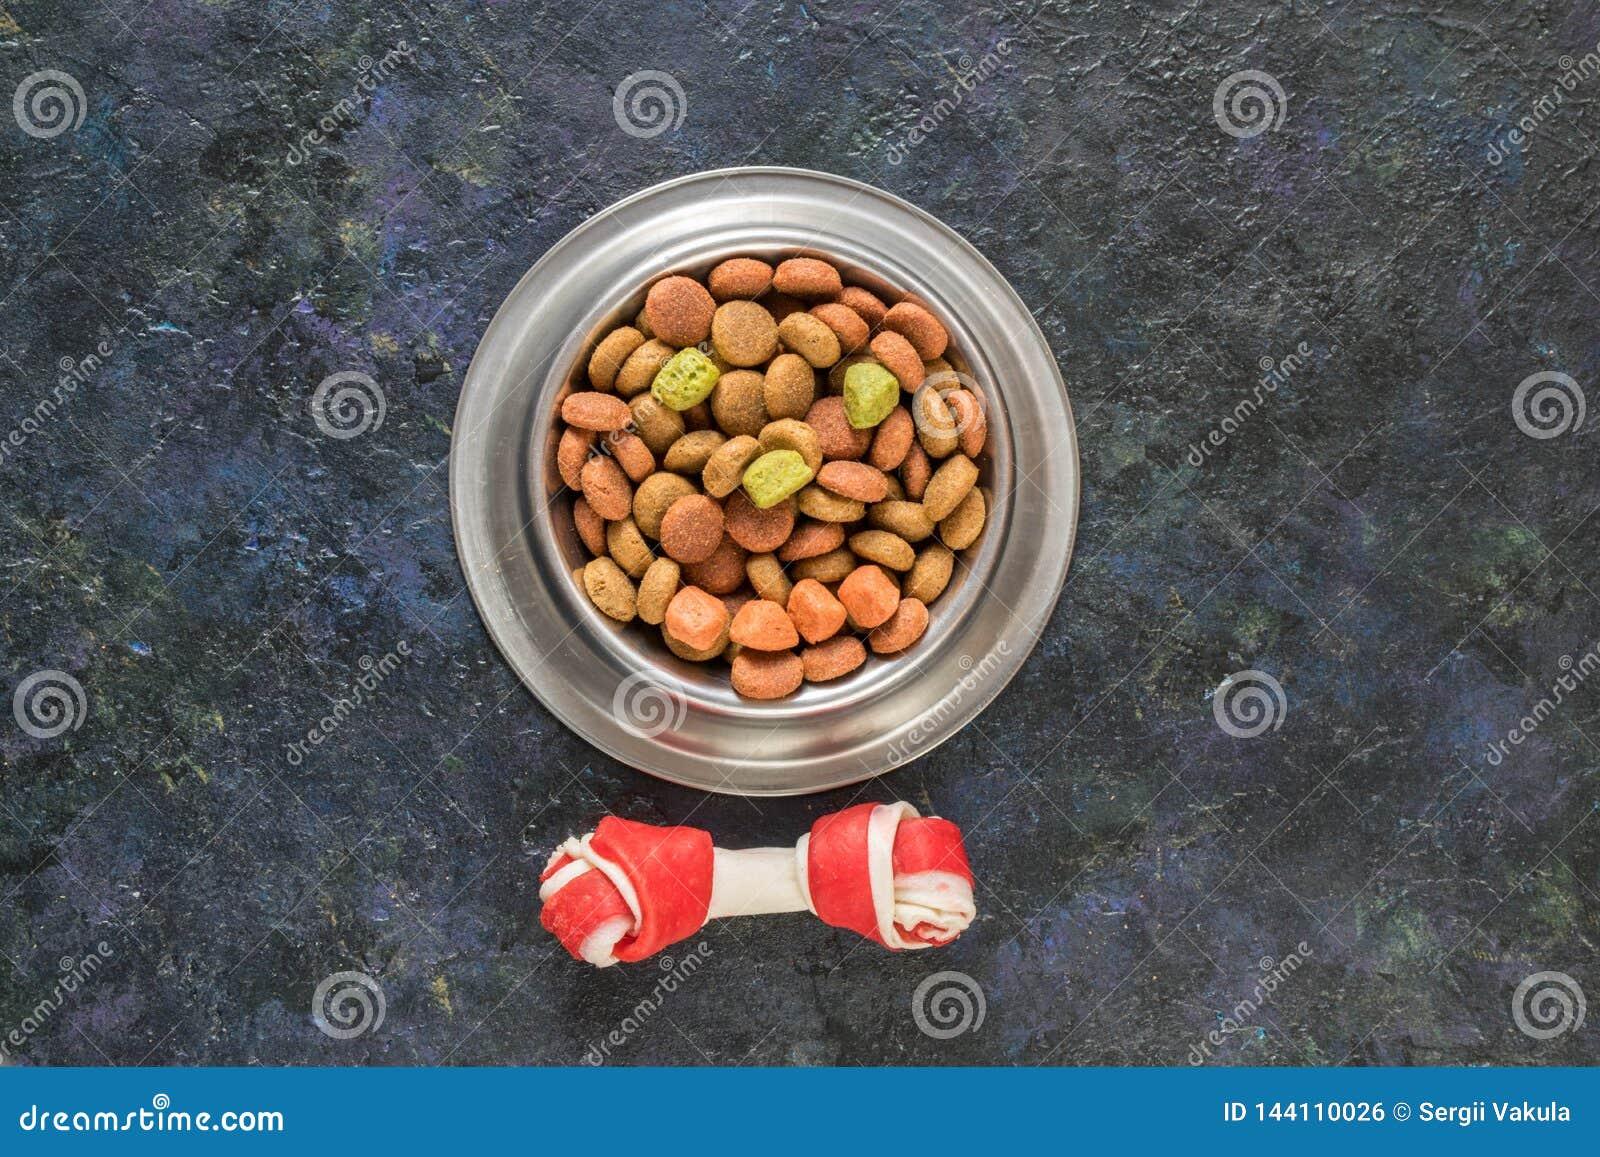 Dog food in metallic bowl on black dark blue background